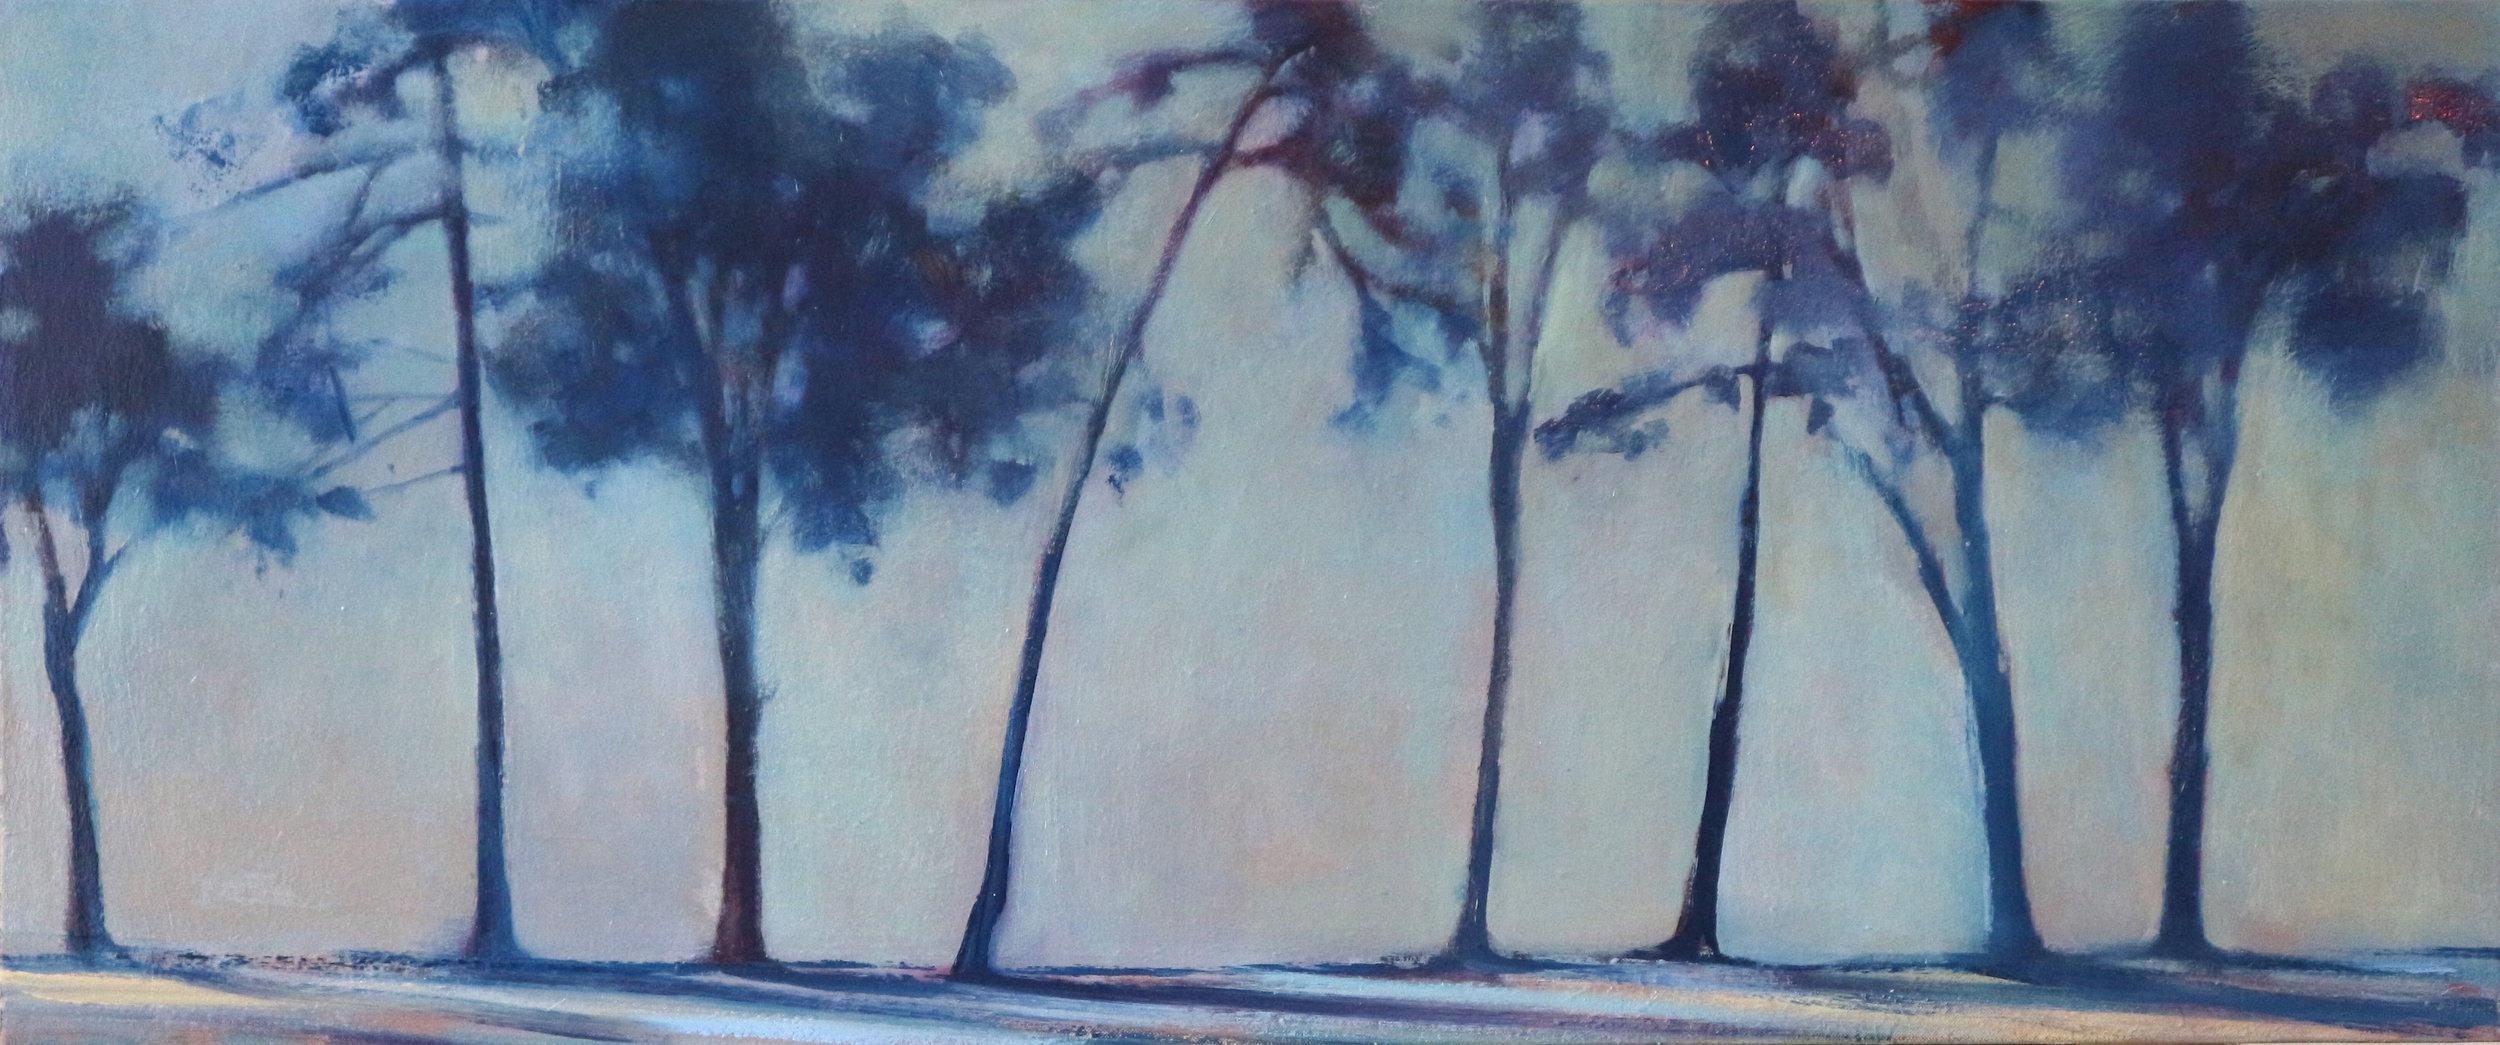 Title: Distant Treeline (I) Size: 50 x 100 cm Medium: Oil on canvas Price: SOLD